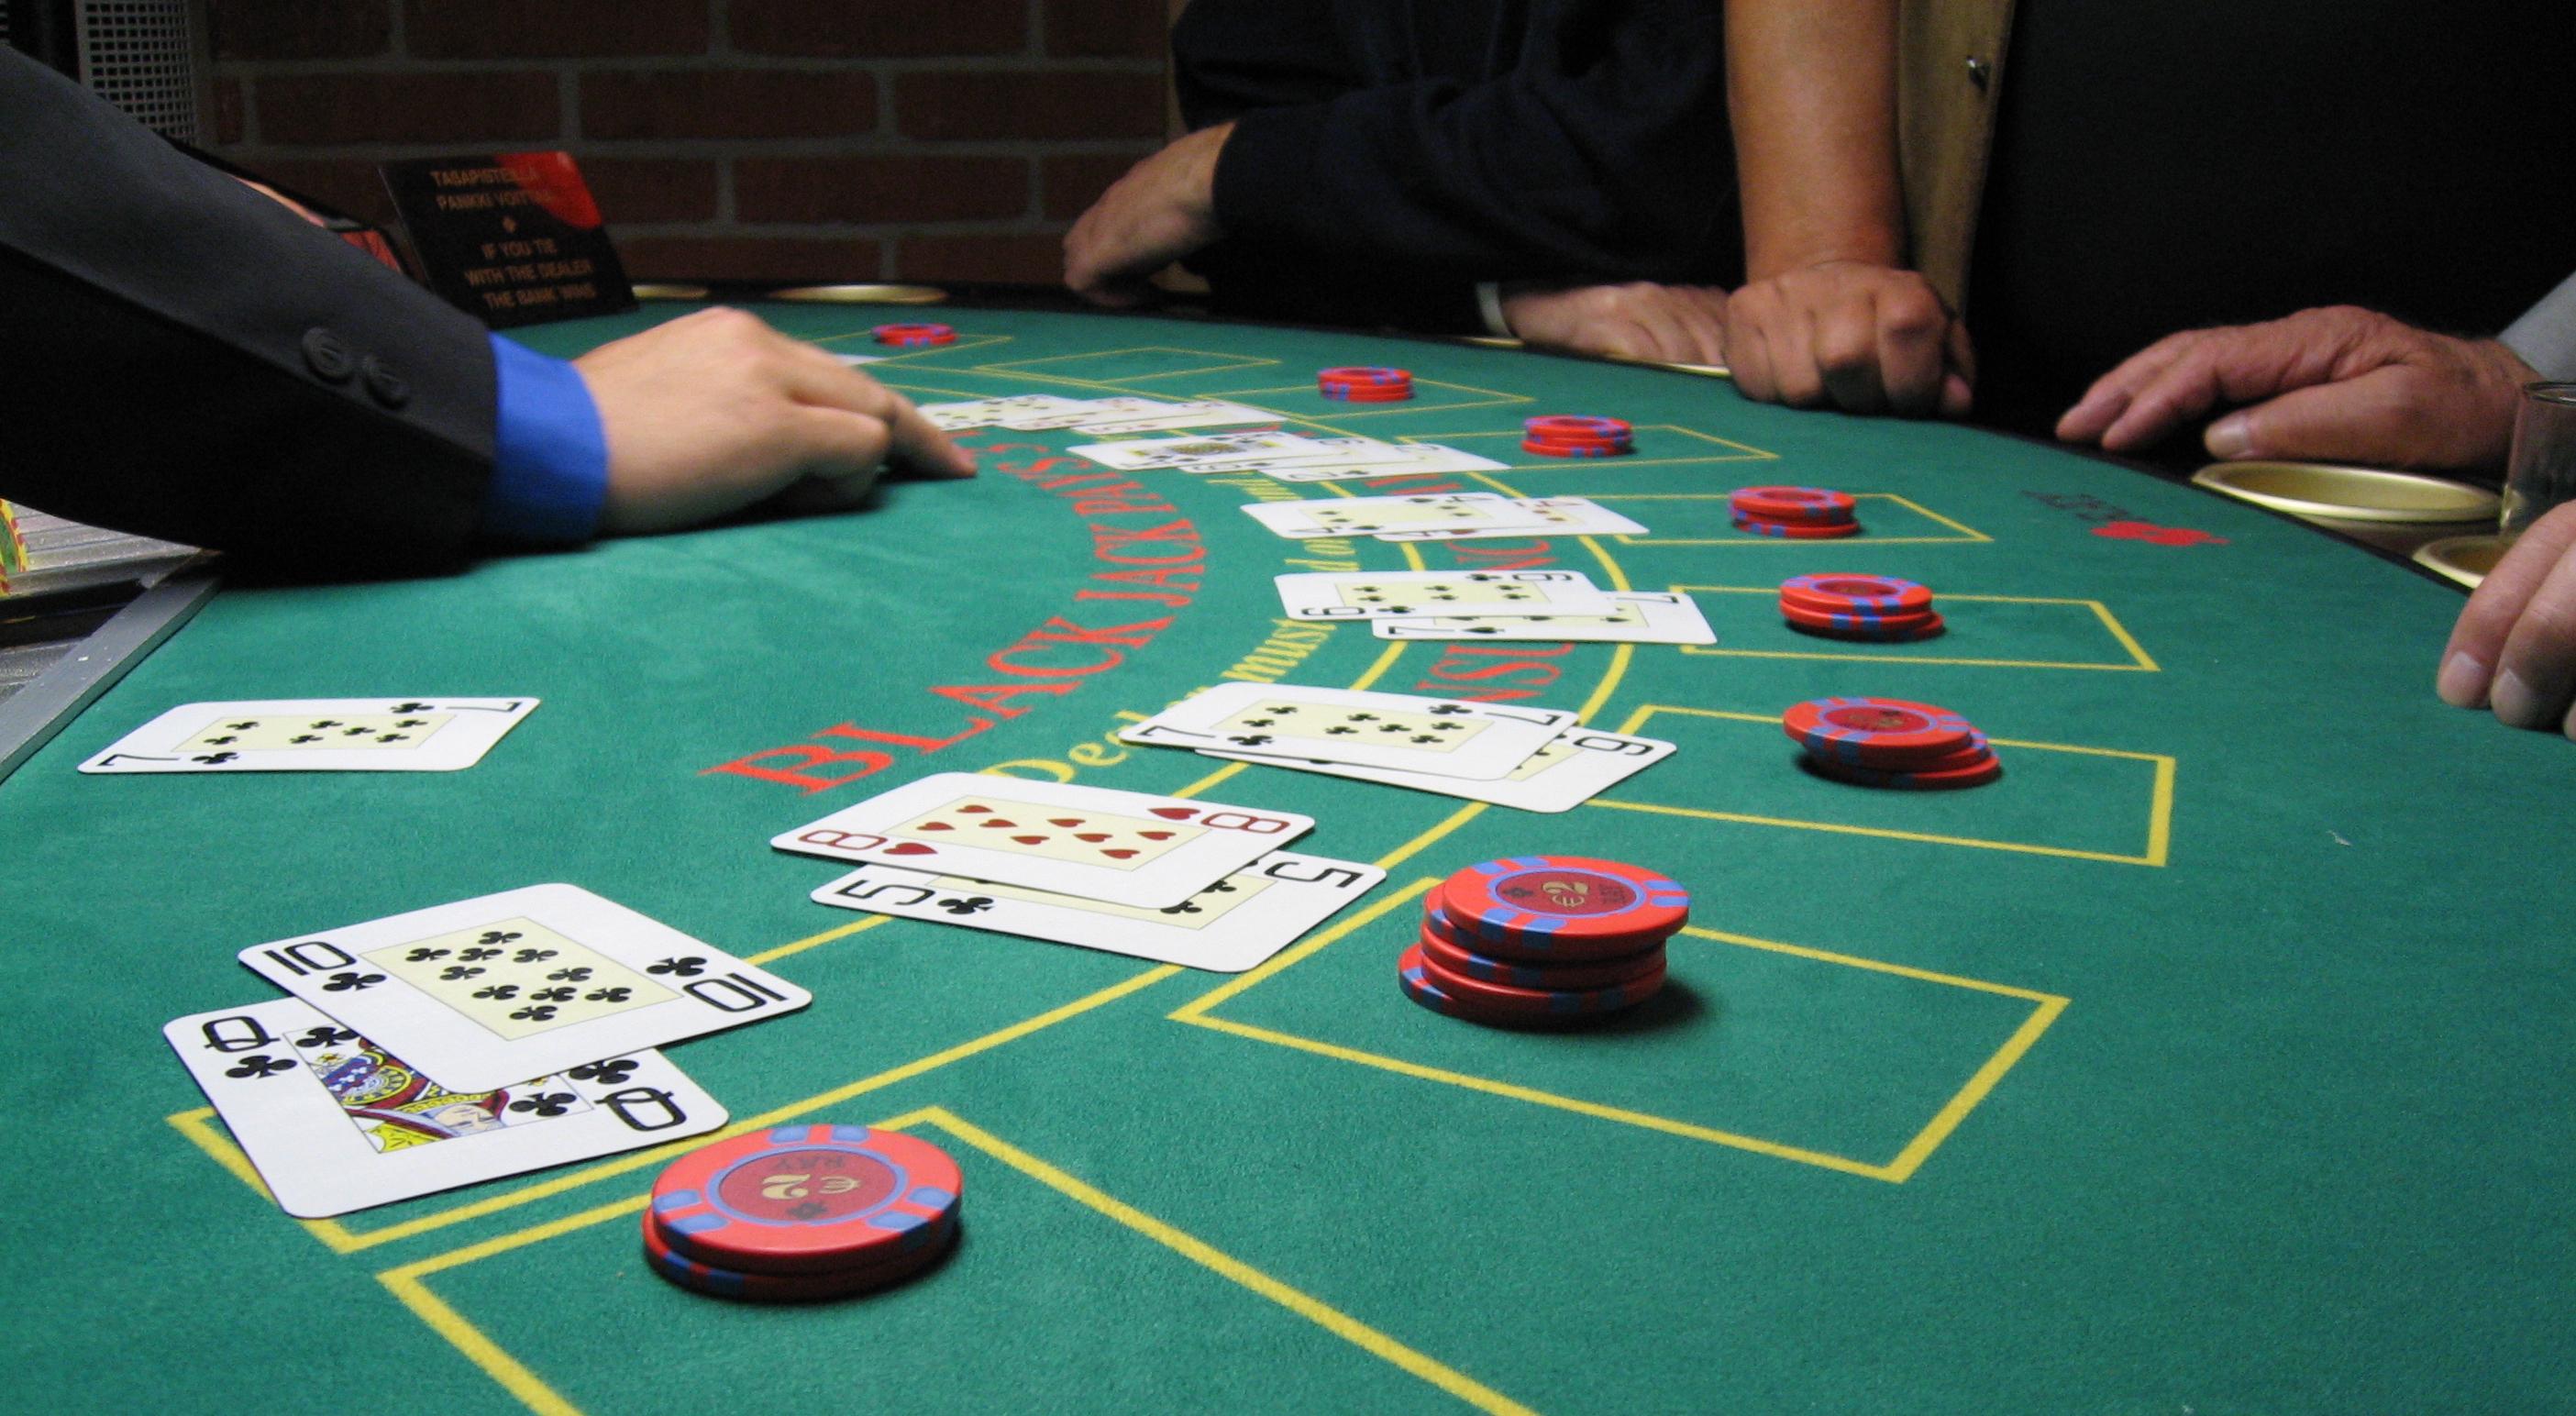 Blackjack strategi_regler_martingale systemet